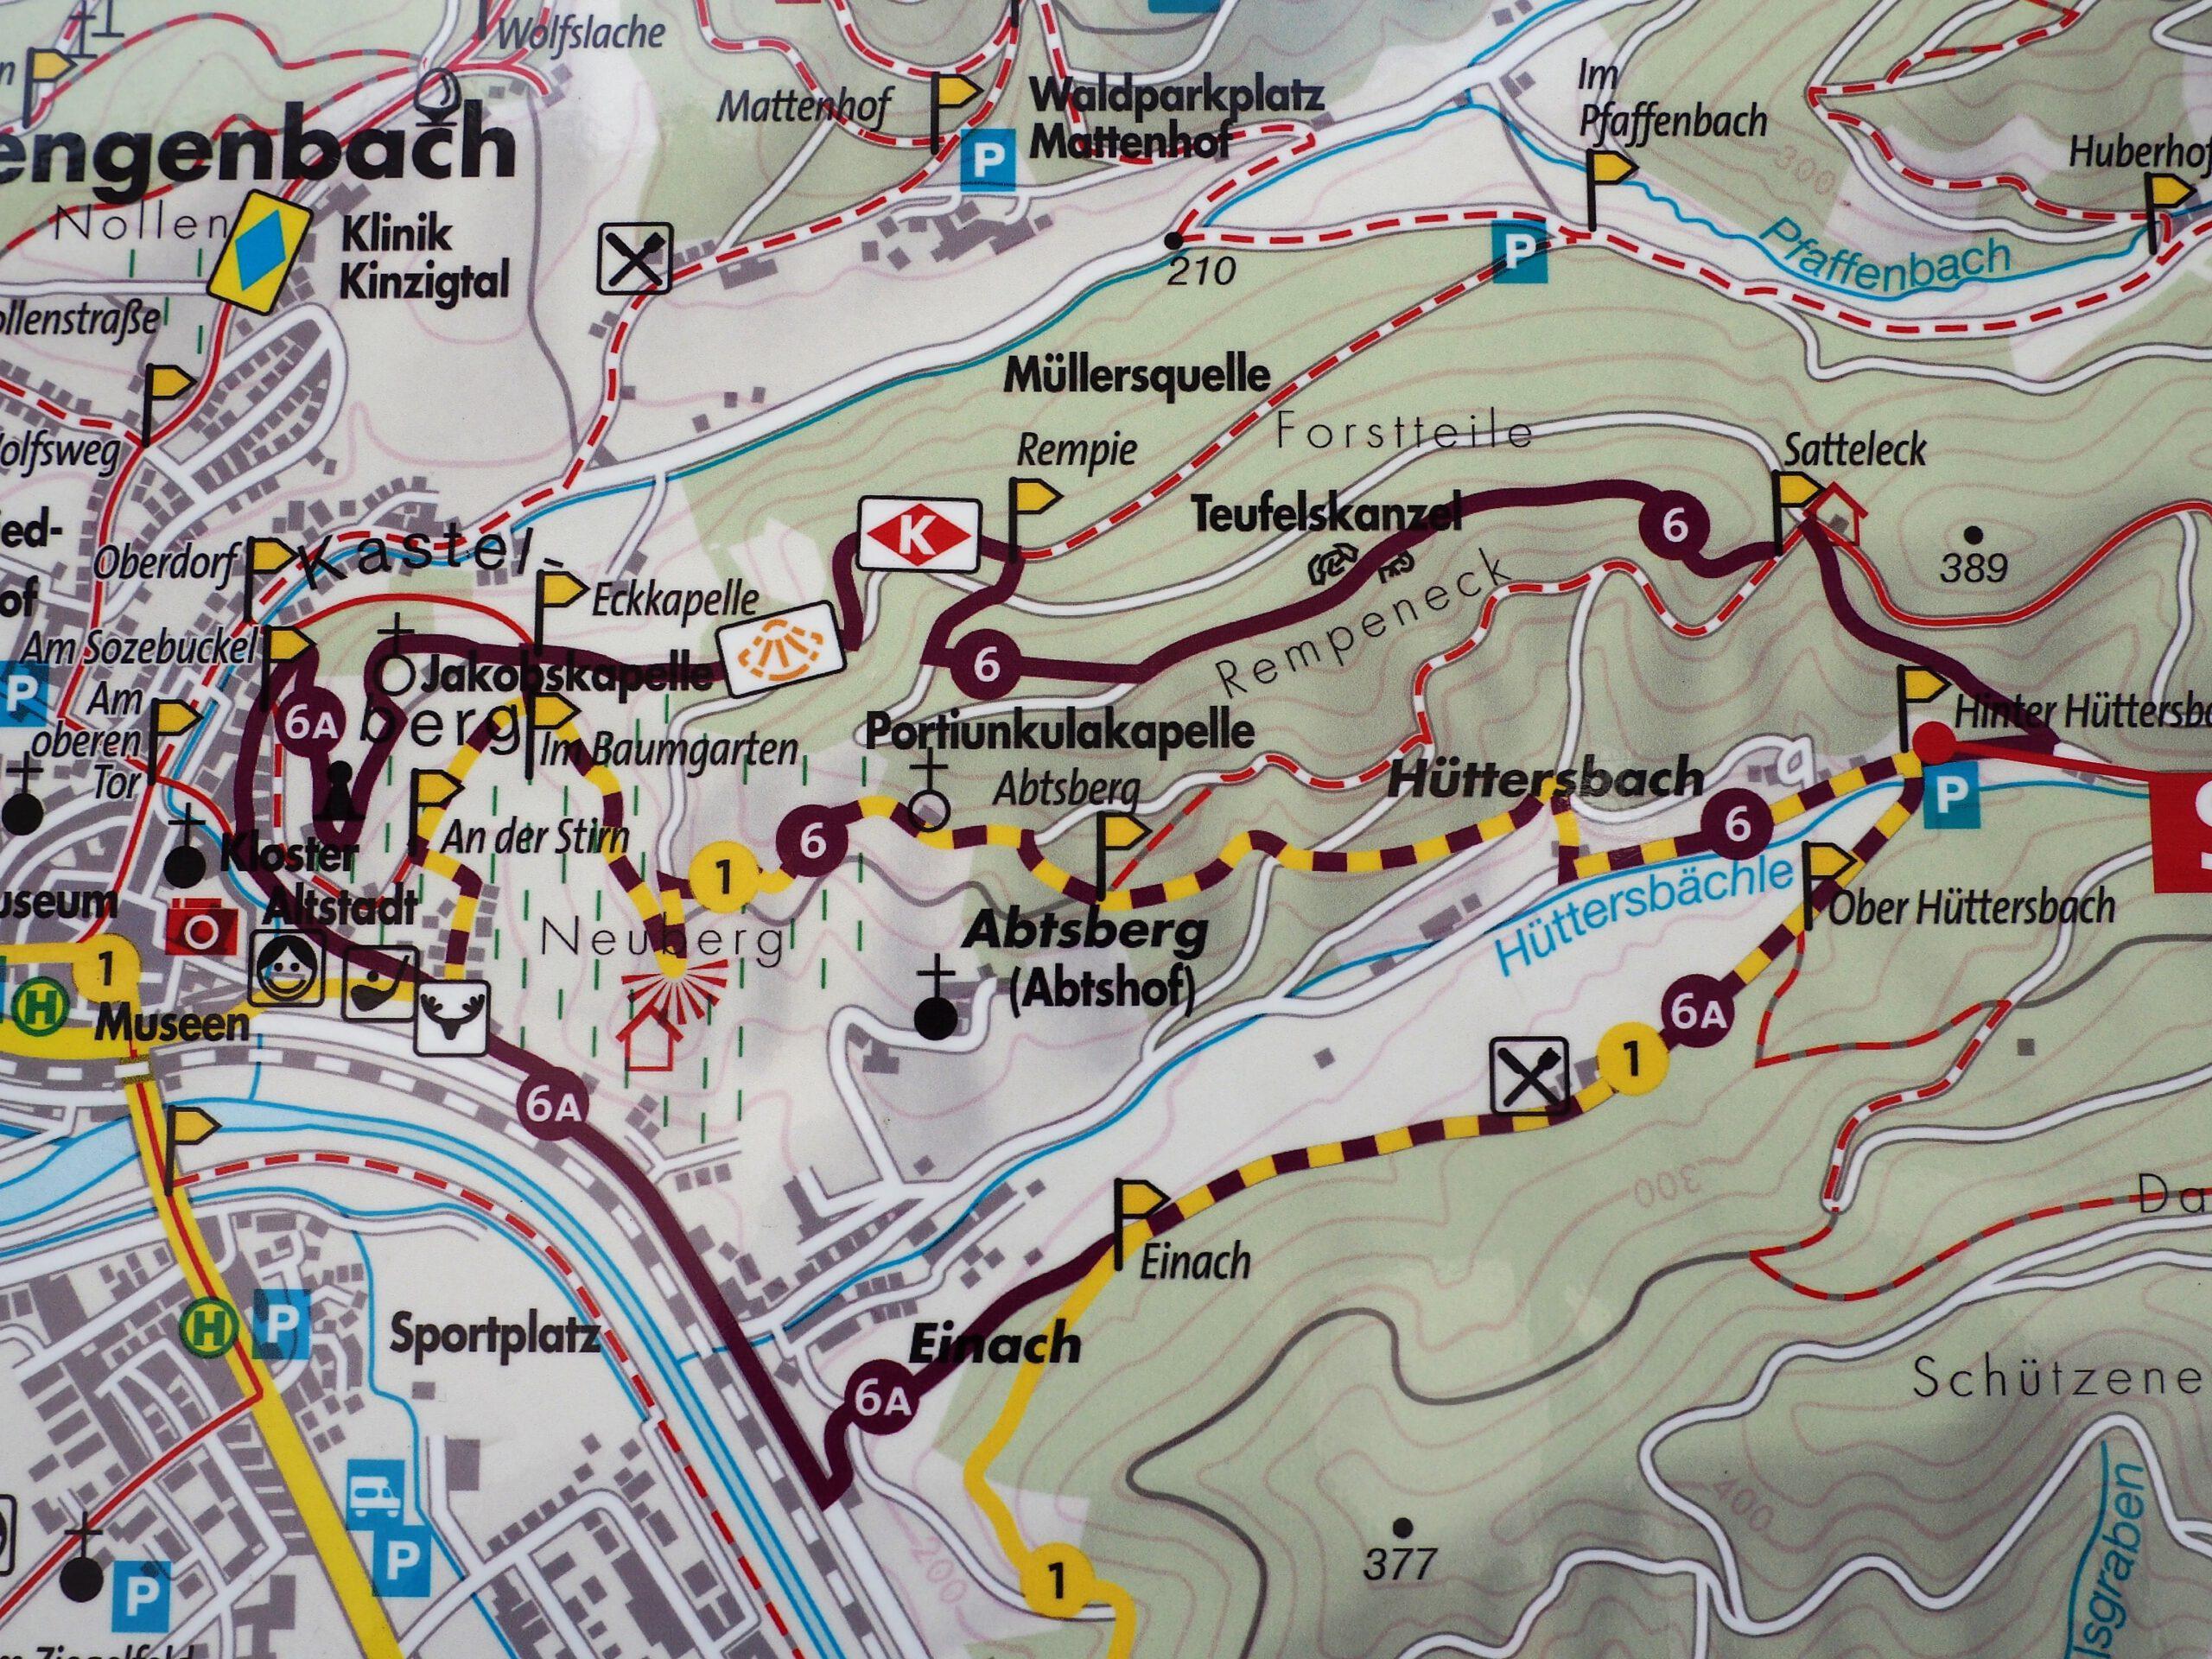 Route Tälerpfad Gengenbach